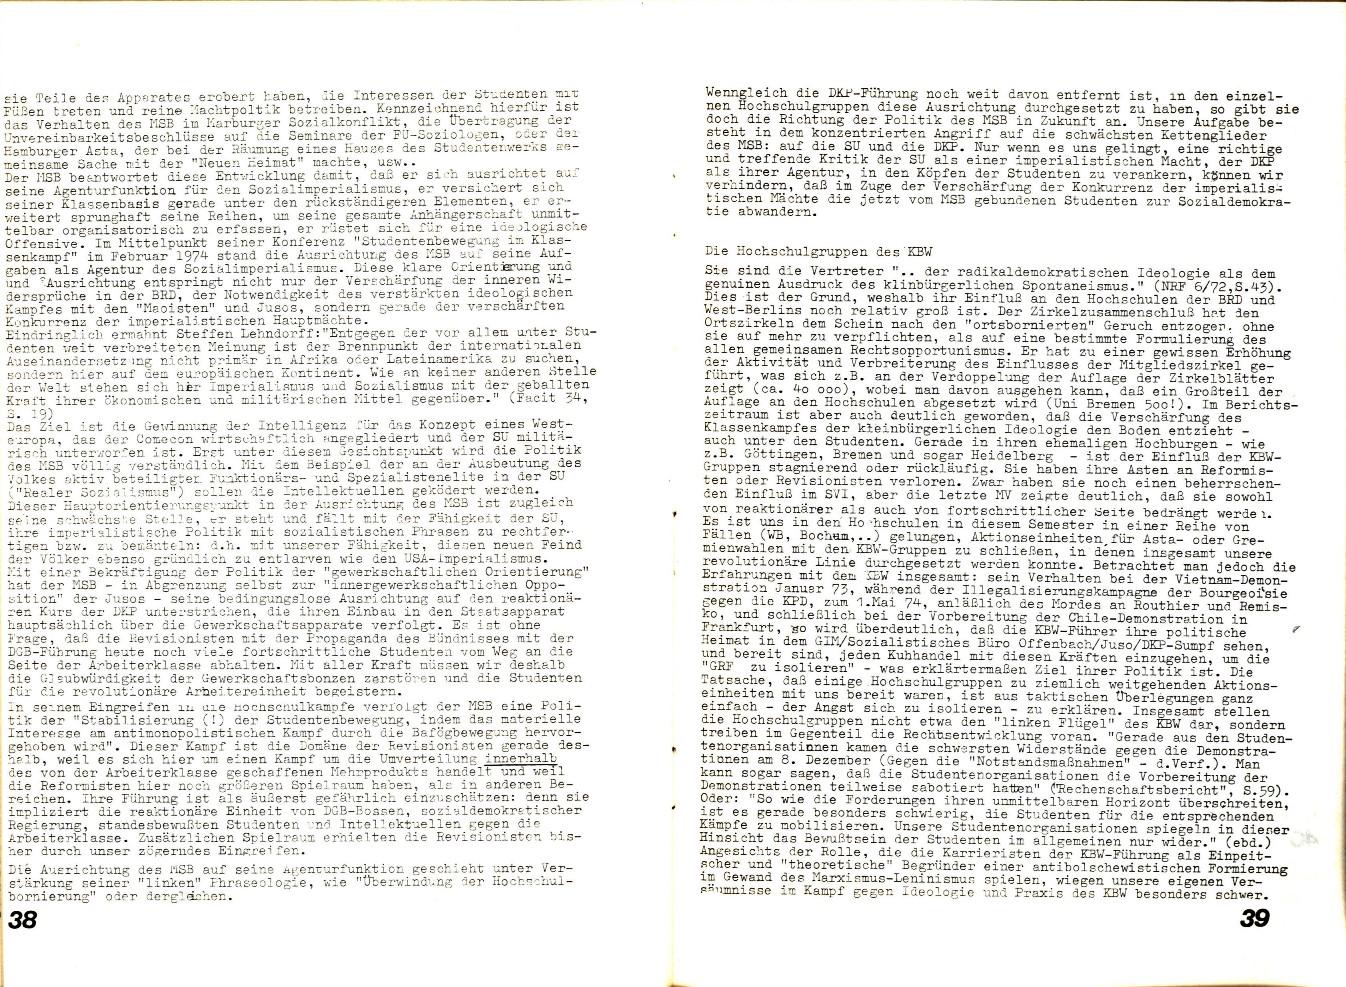 KSV_1974_Rechenschaftsbericht_21